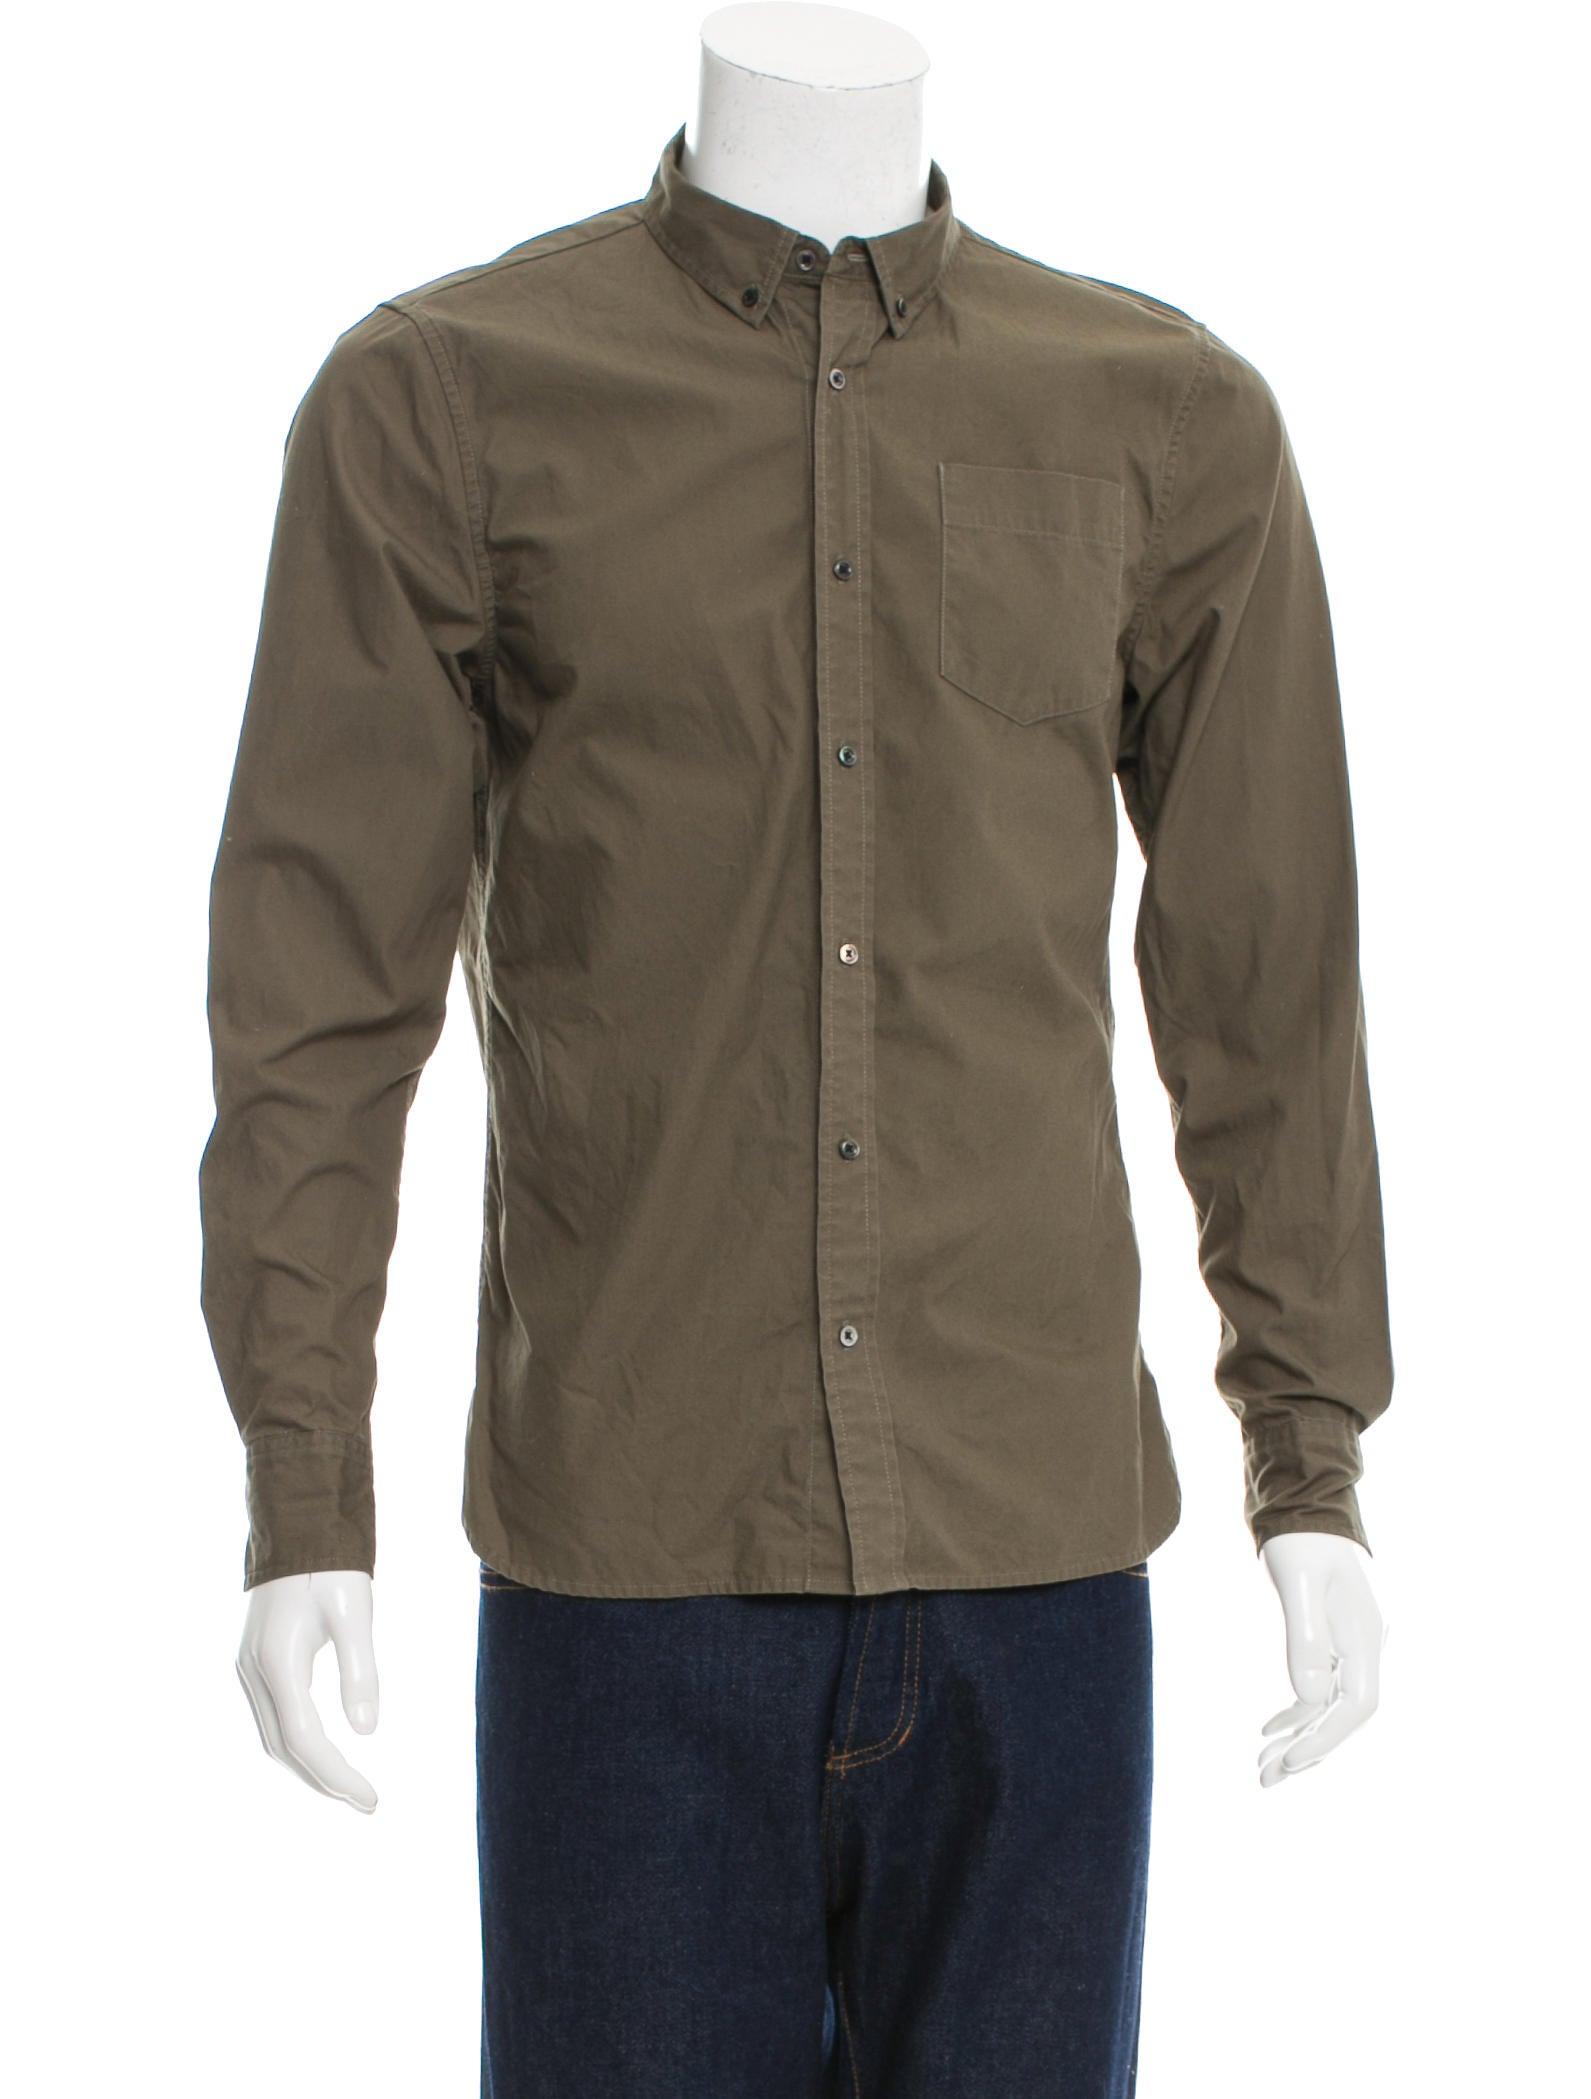 Frame Denim Long Sleeve Button Up Shirt Clothing